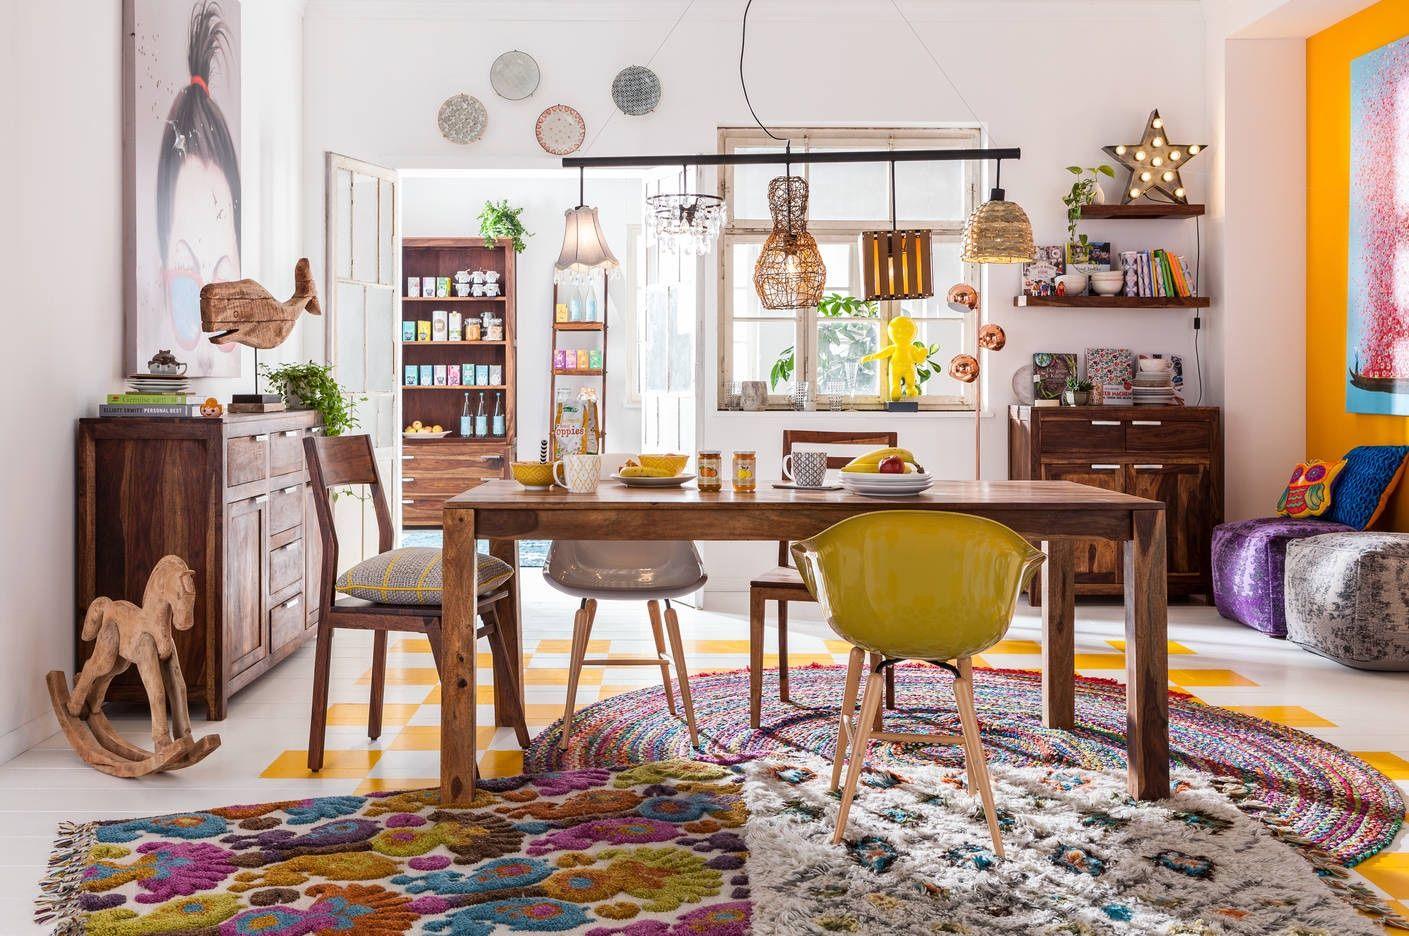 Isaloni Ebook & Kare Design @ iSaloni 2017 (4)The best selection of furniture design ...